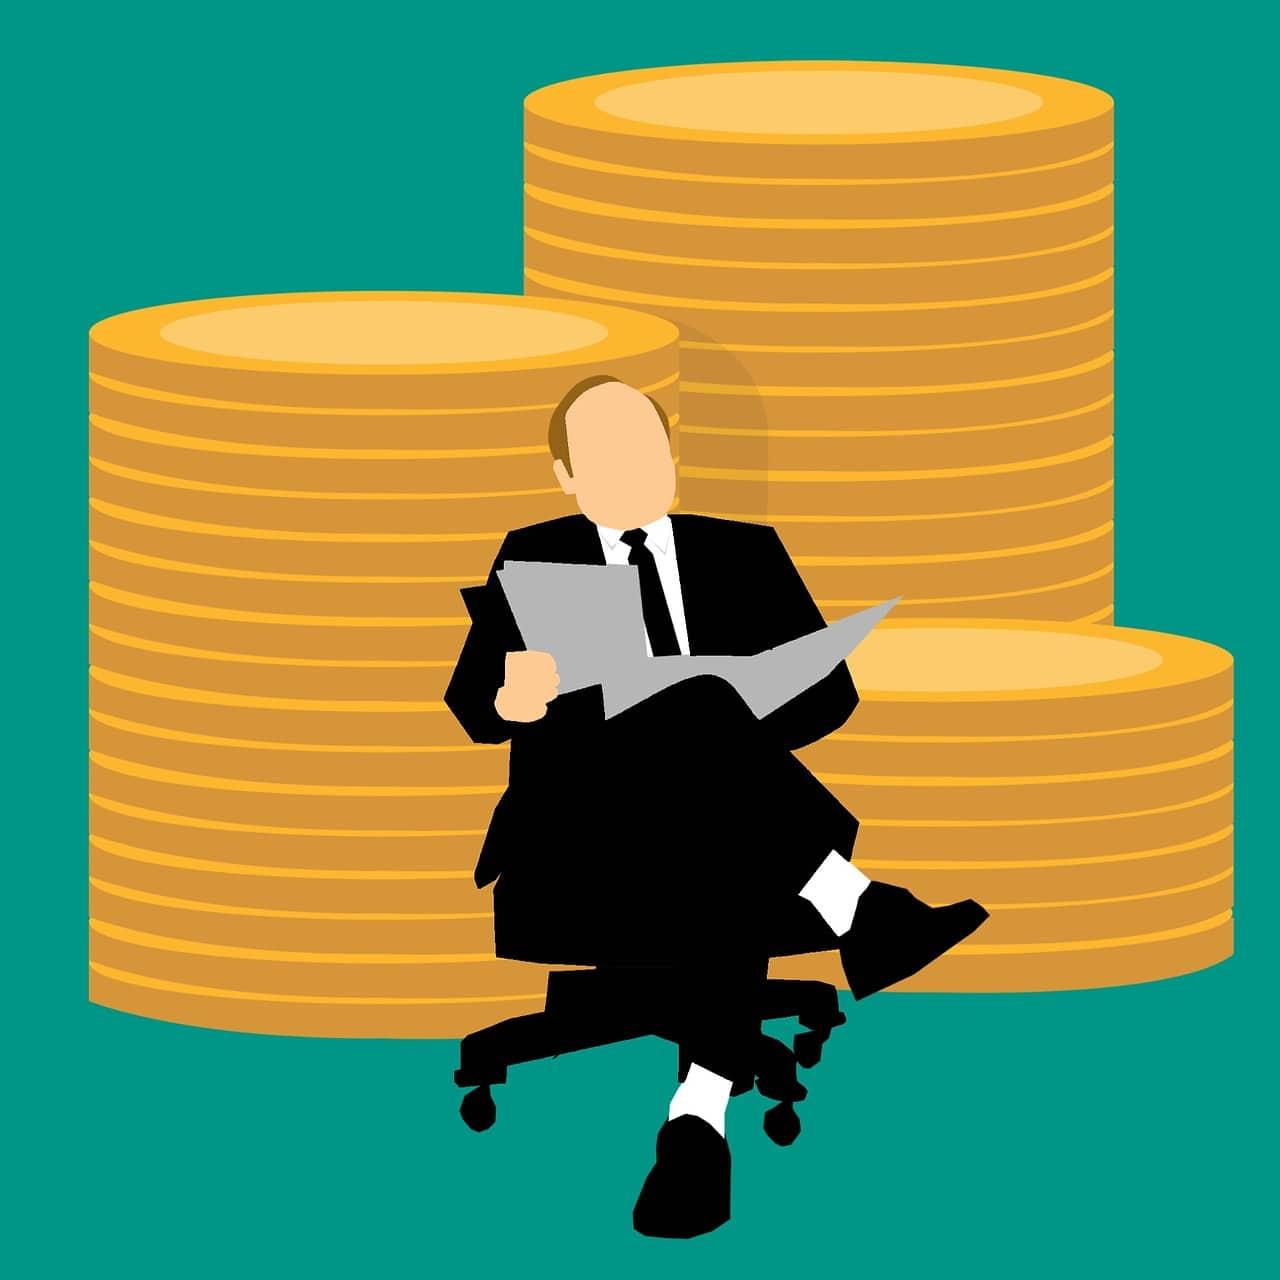 עורך דין ומטבעות